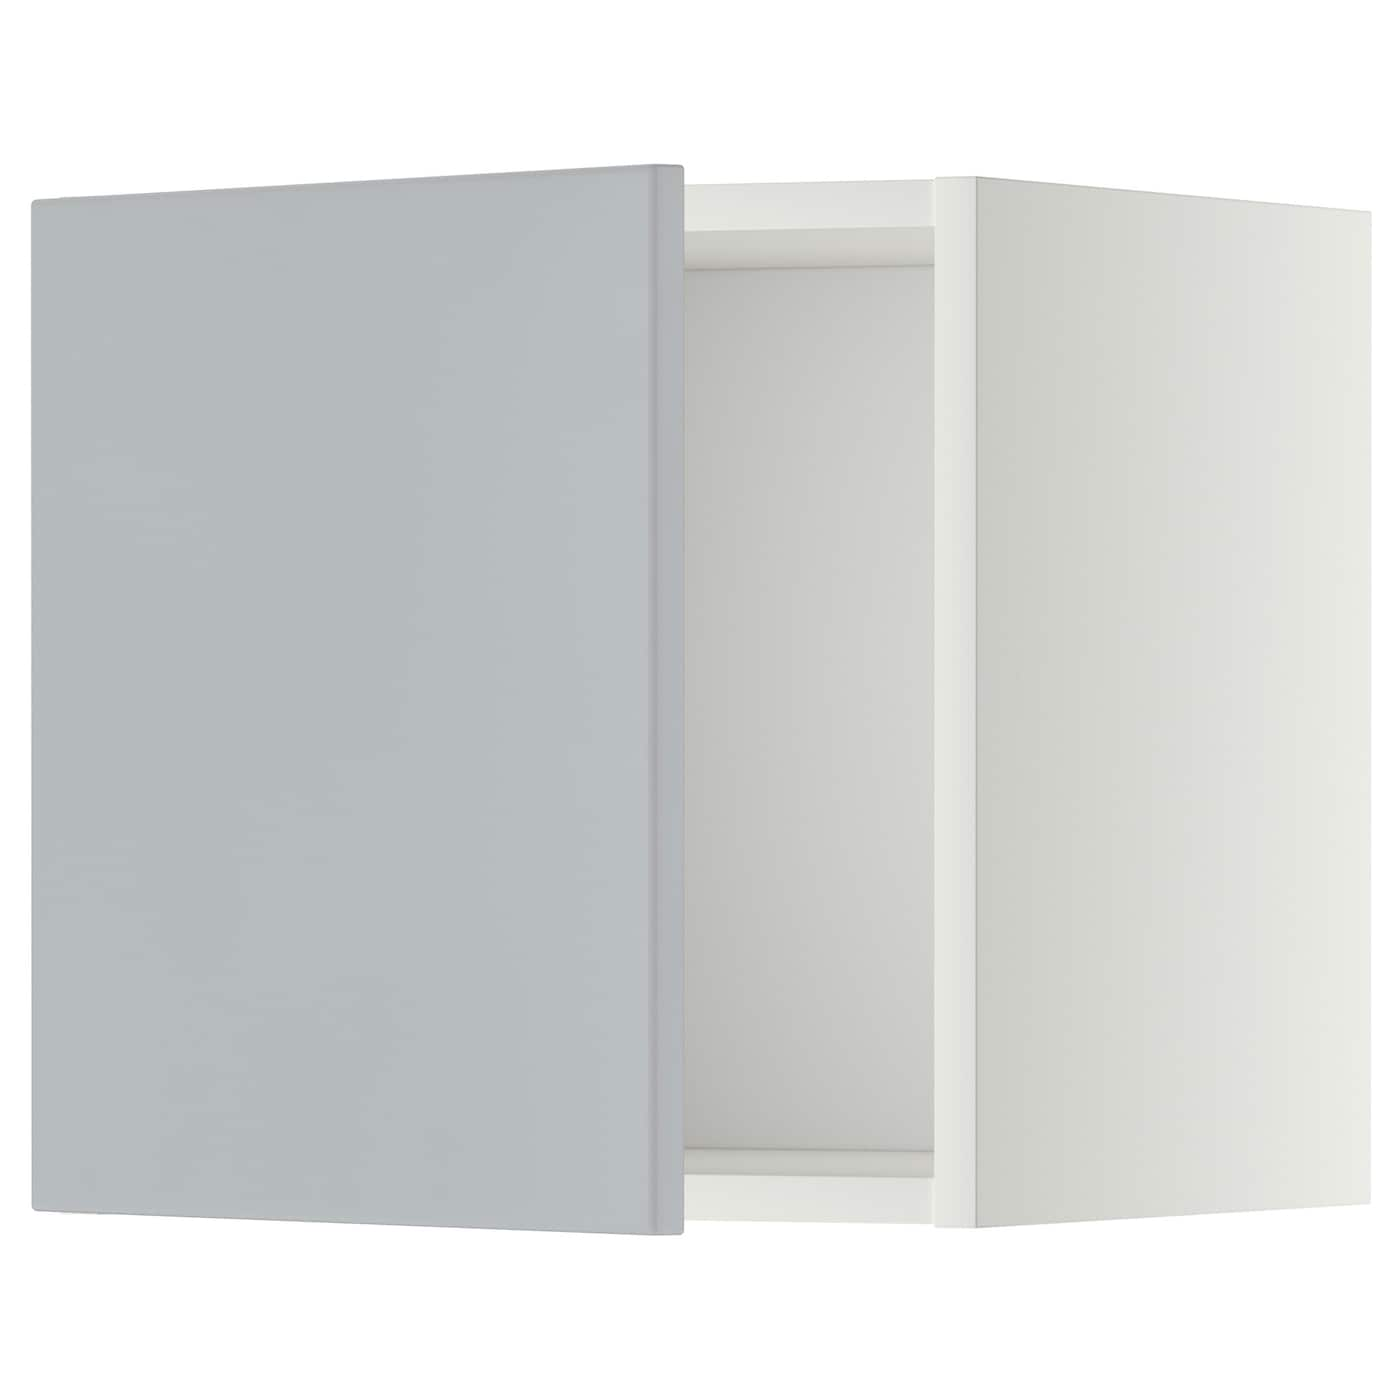 metod wall cabinet white veddinge grey 40x40 cm ikea. Black Bedroom Furniture Sets. Home Design Ideas